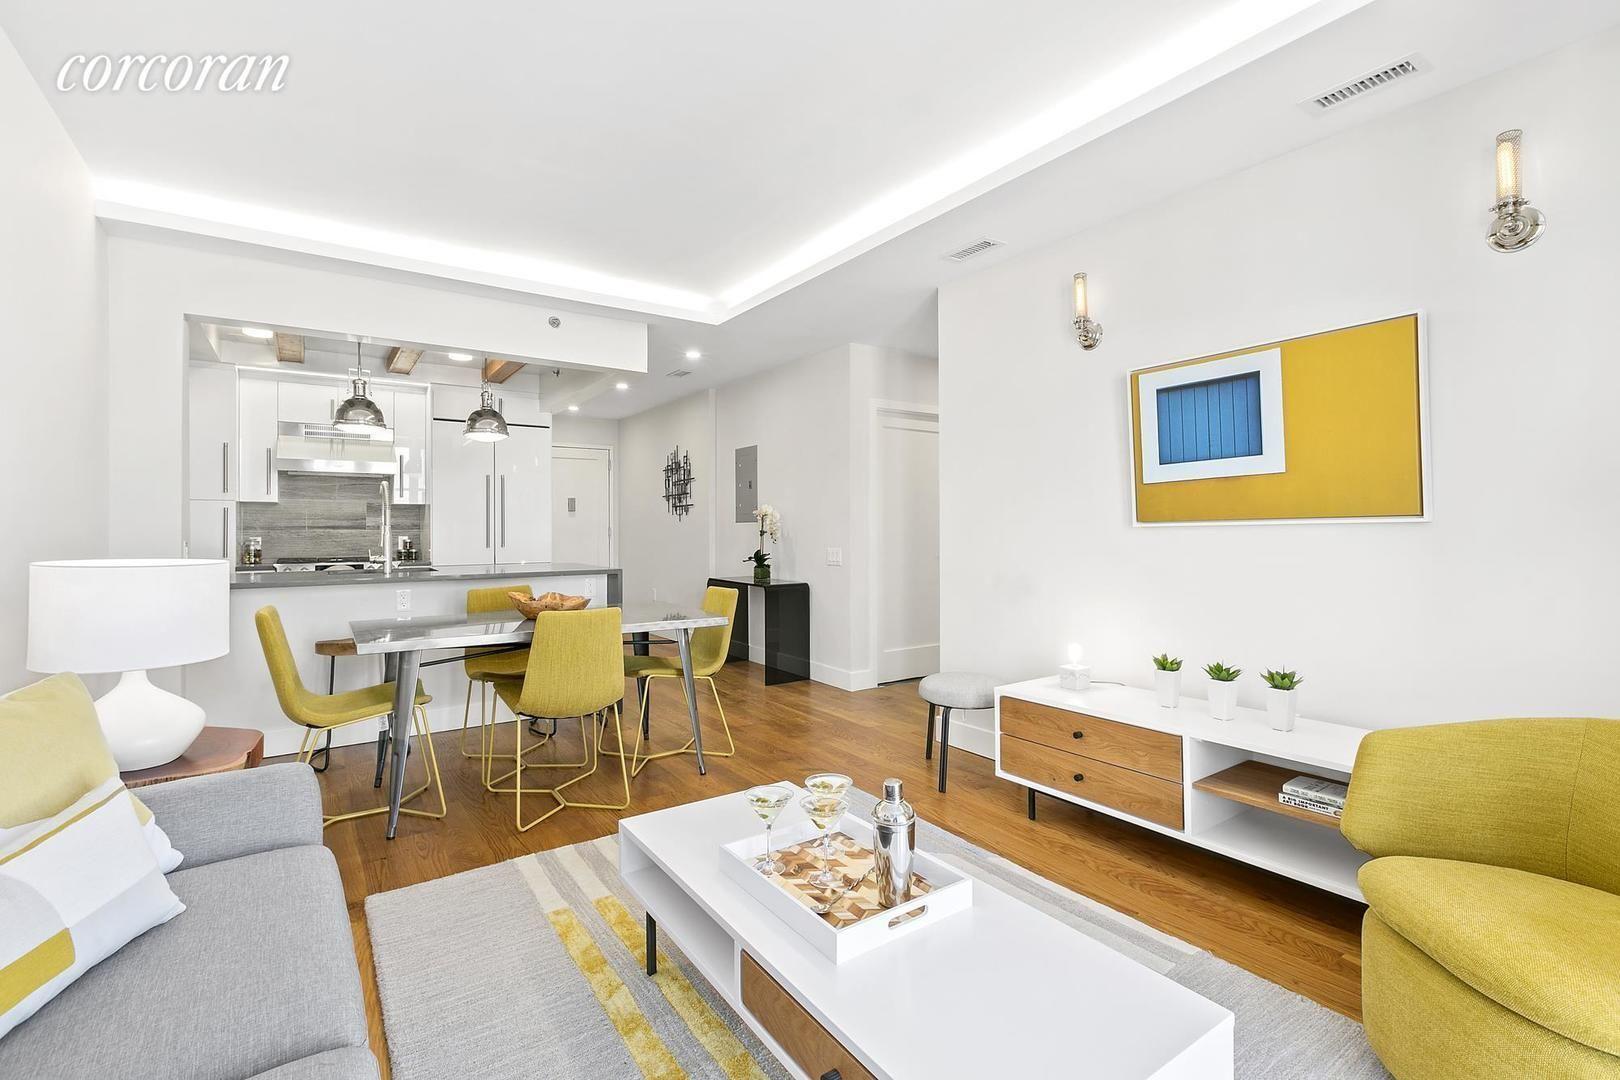 Apartment for sale at 175 Jackson Street, Apt 2C